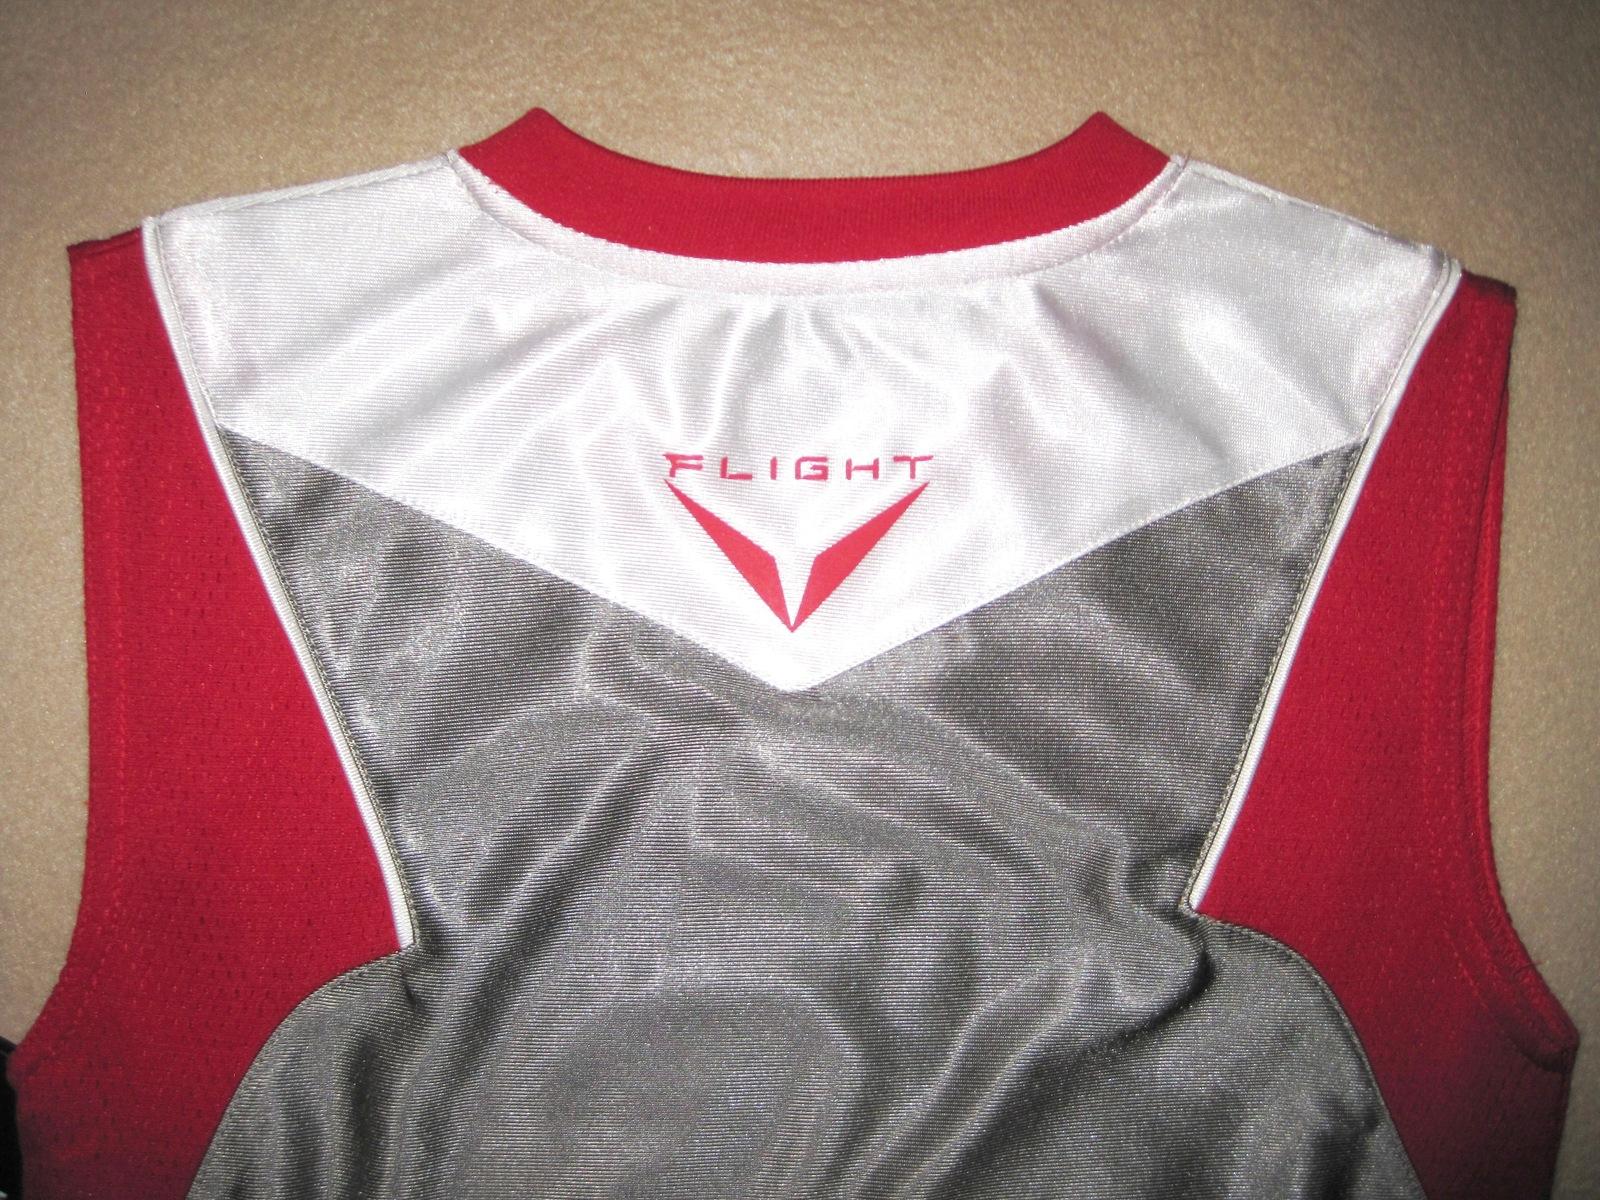 BOYS 6 - Nike - Flight Grey-Red-White BASKETBALL SPORTS JERSEY image 5